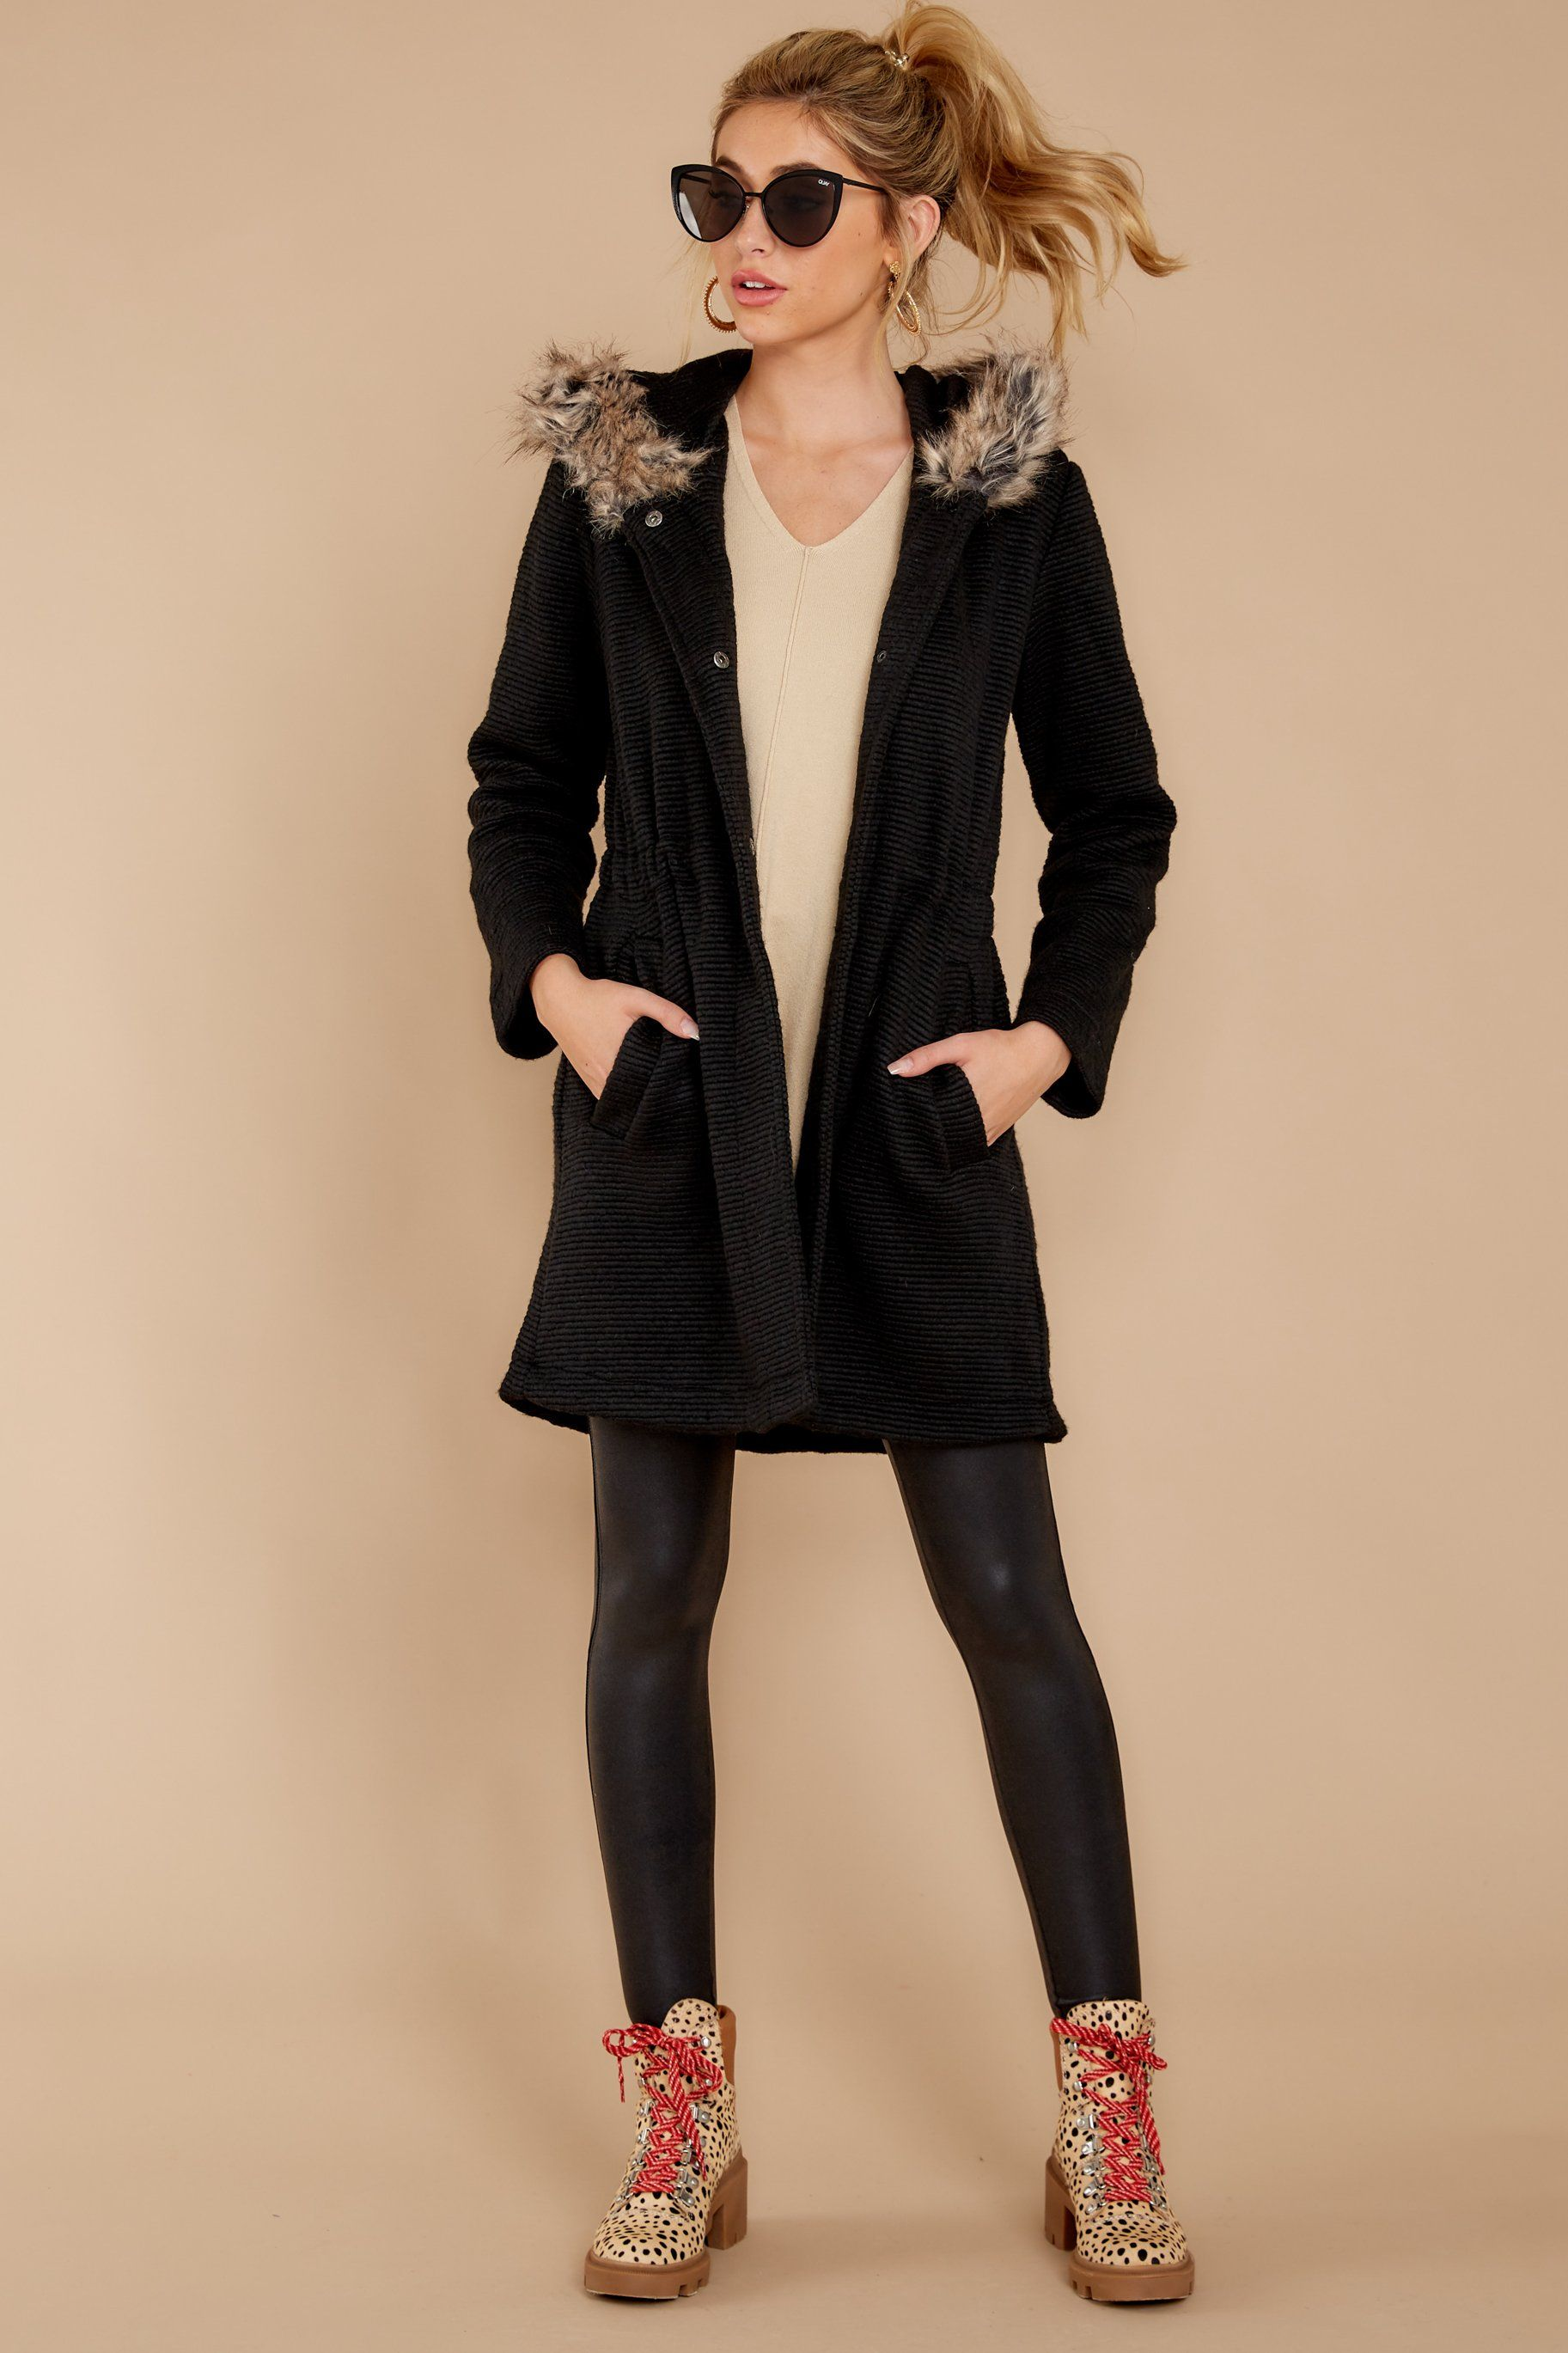 Bb Dakota Black Coat Ribbed Vegan Fur Button Coat Outerwear 148 Red Dress Black Coat Cute Coats [ 2738 x 1825 Pixel ]